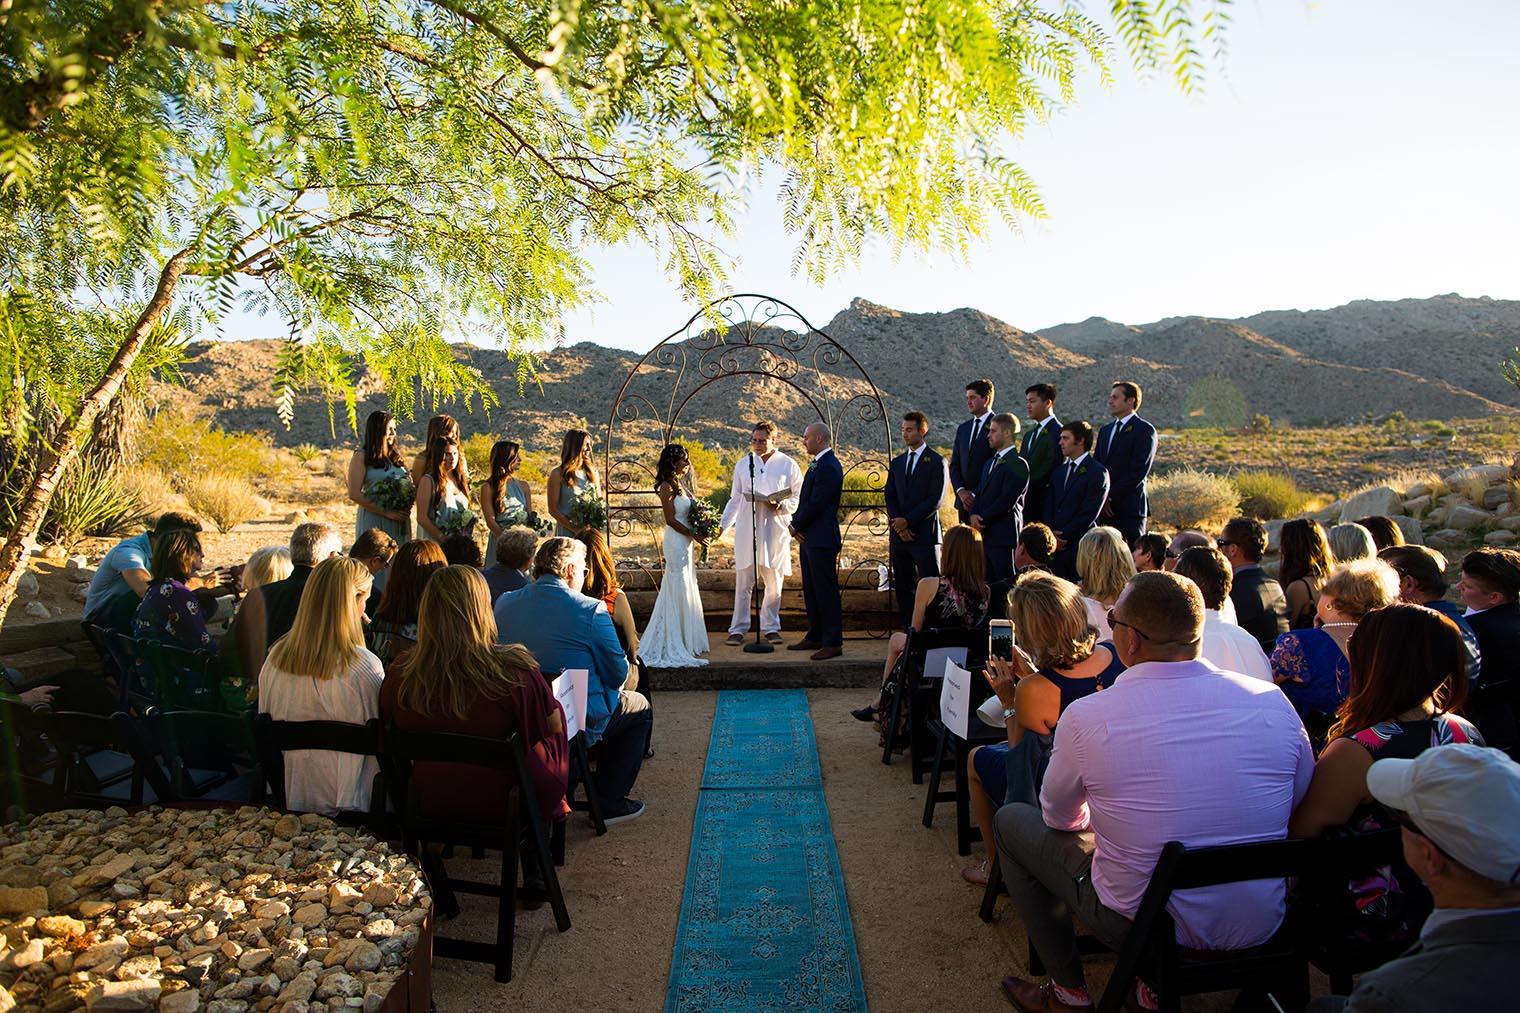 Sacred Sands Joshua Tree Wedding Ceremony 34 Dustin Cantrell